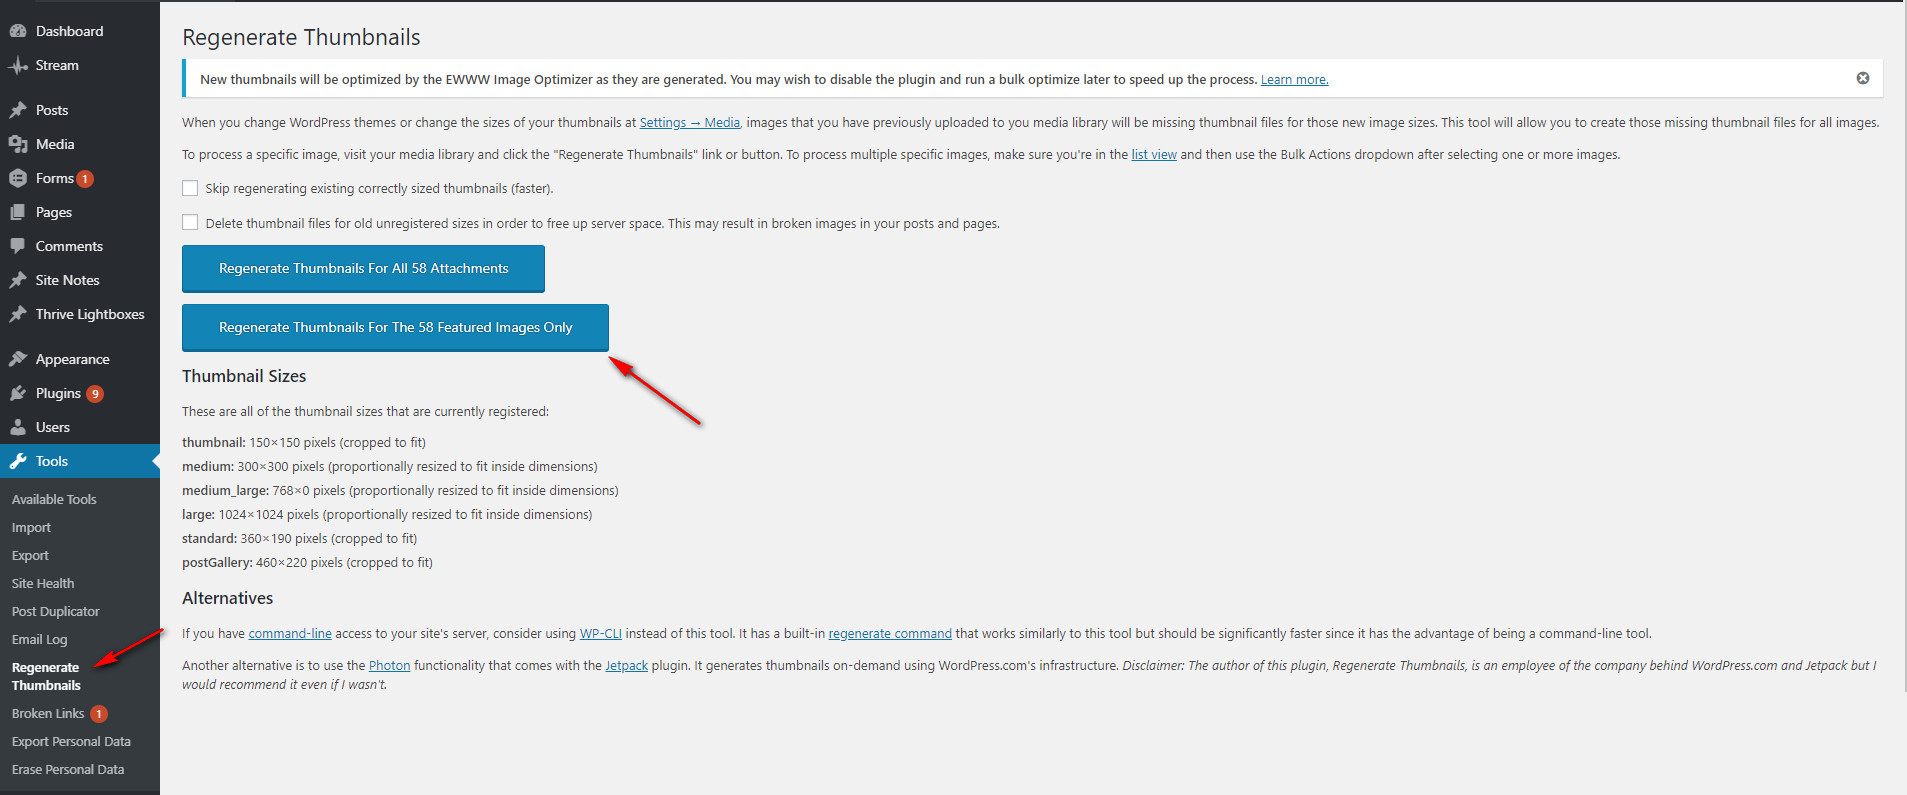 How to move WordPress images to Amazon S3 - Imarketingonly